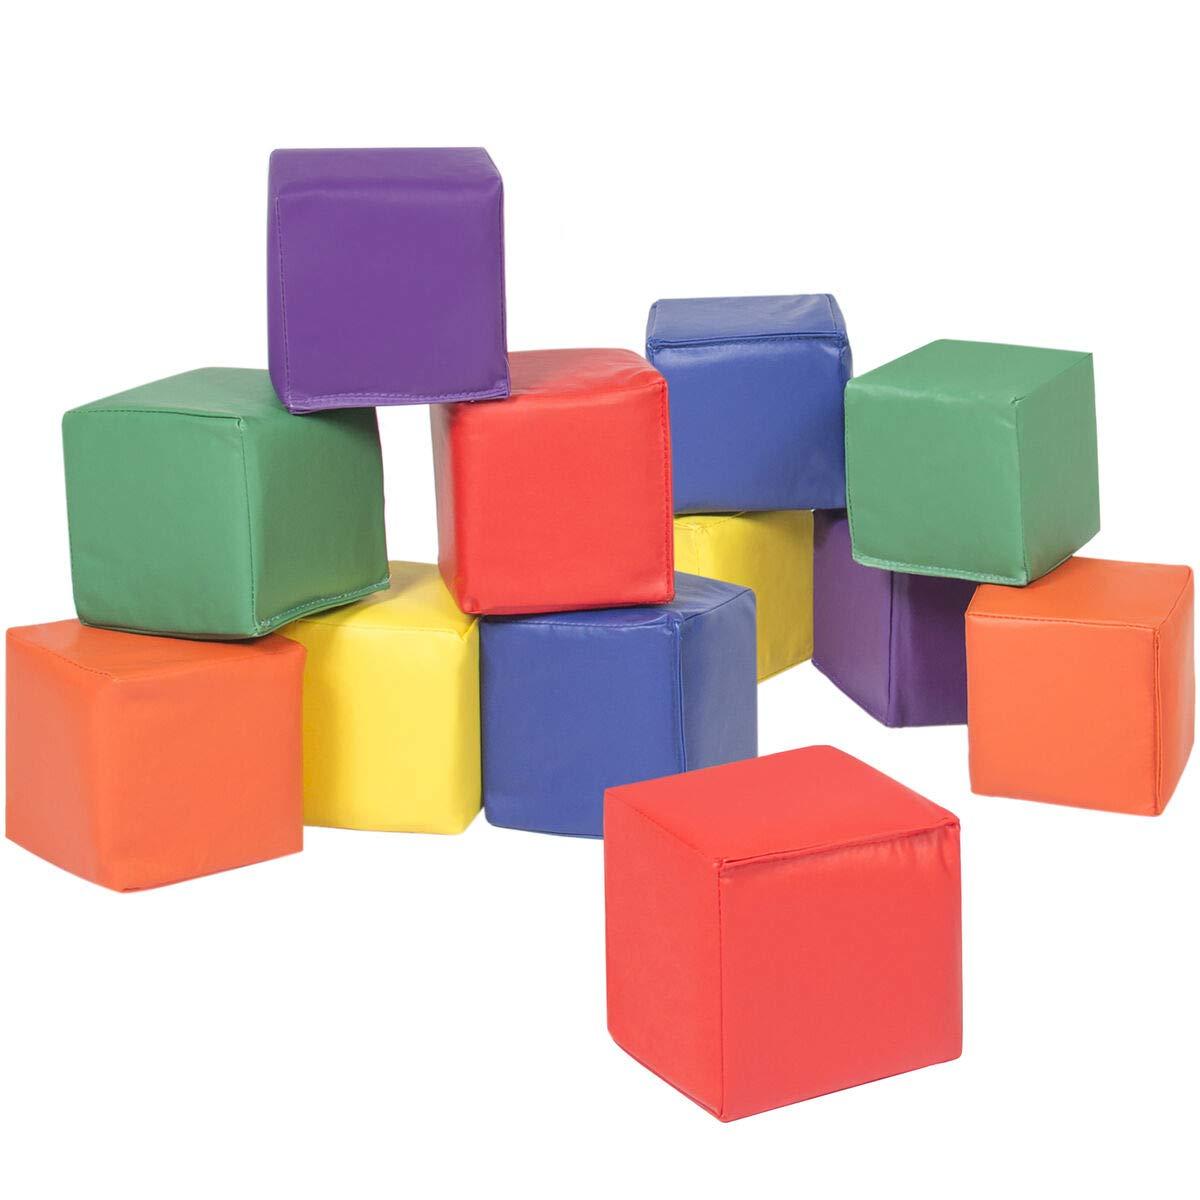 12pc Soft Big Foam Blocks Play Set Sensory Gross Motor Developmental Skills, Best Children's Toys 2019